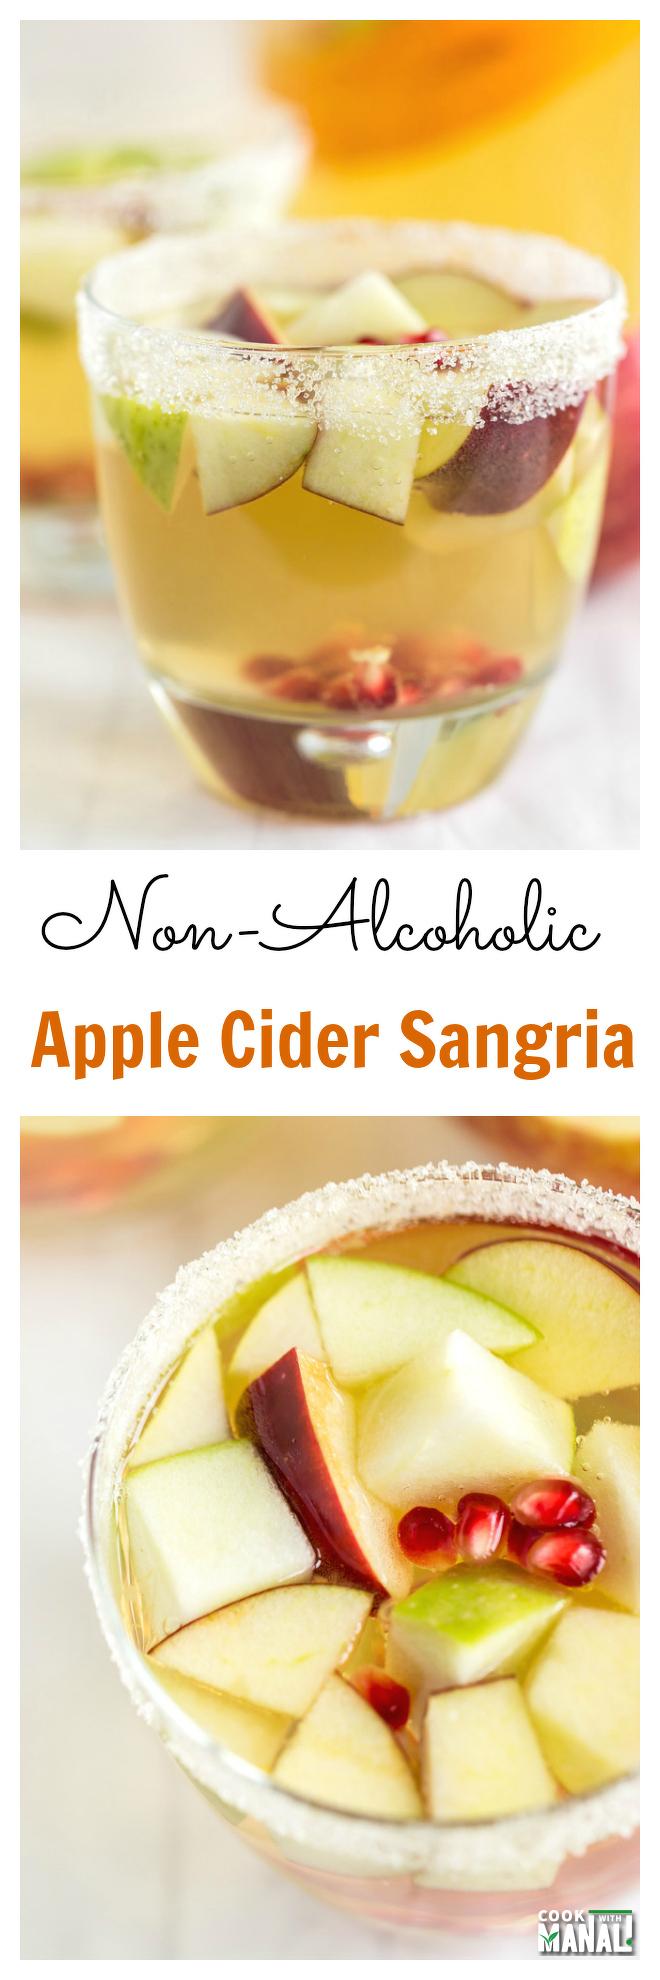 Non Alcoholic Apple Cider Sangria Collage